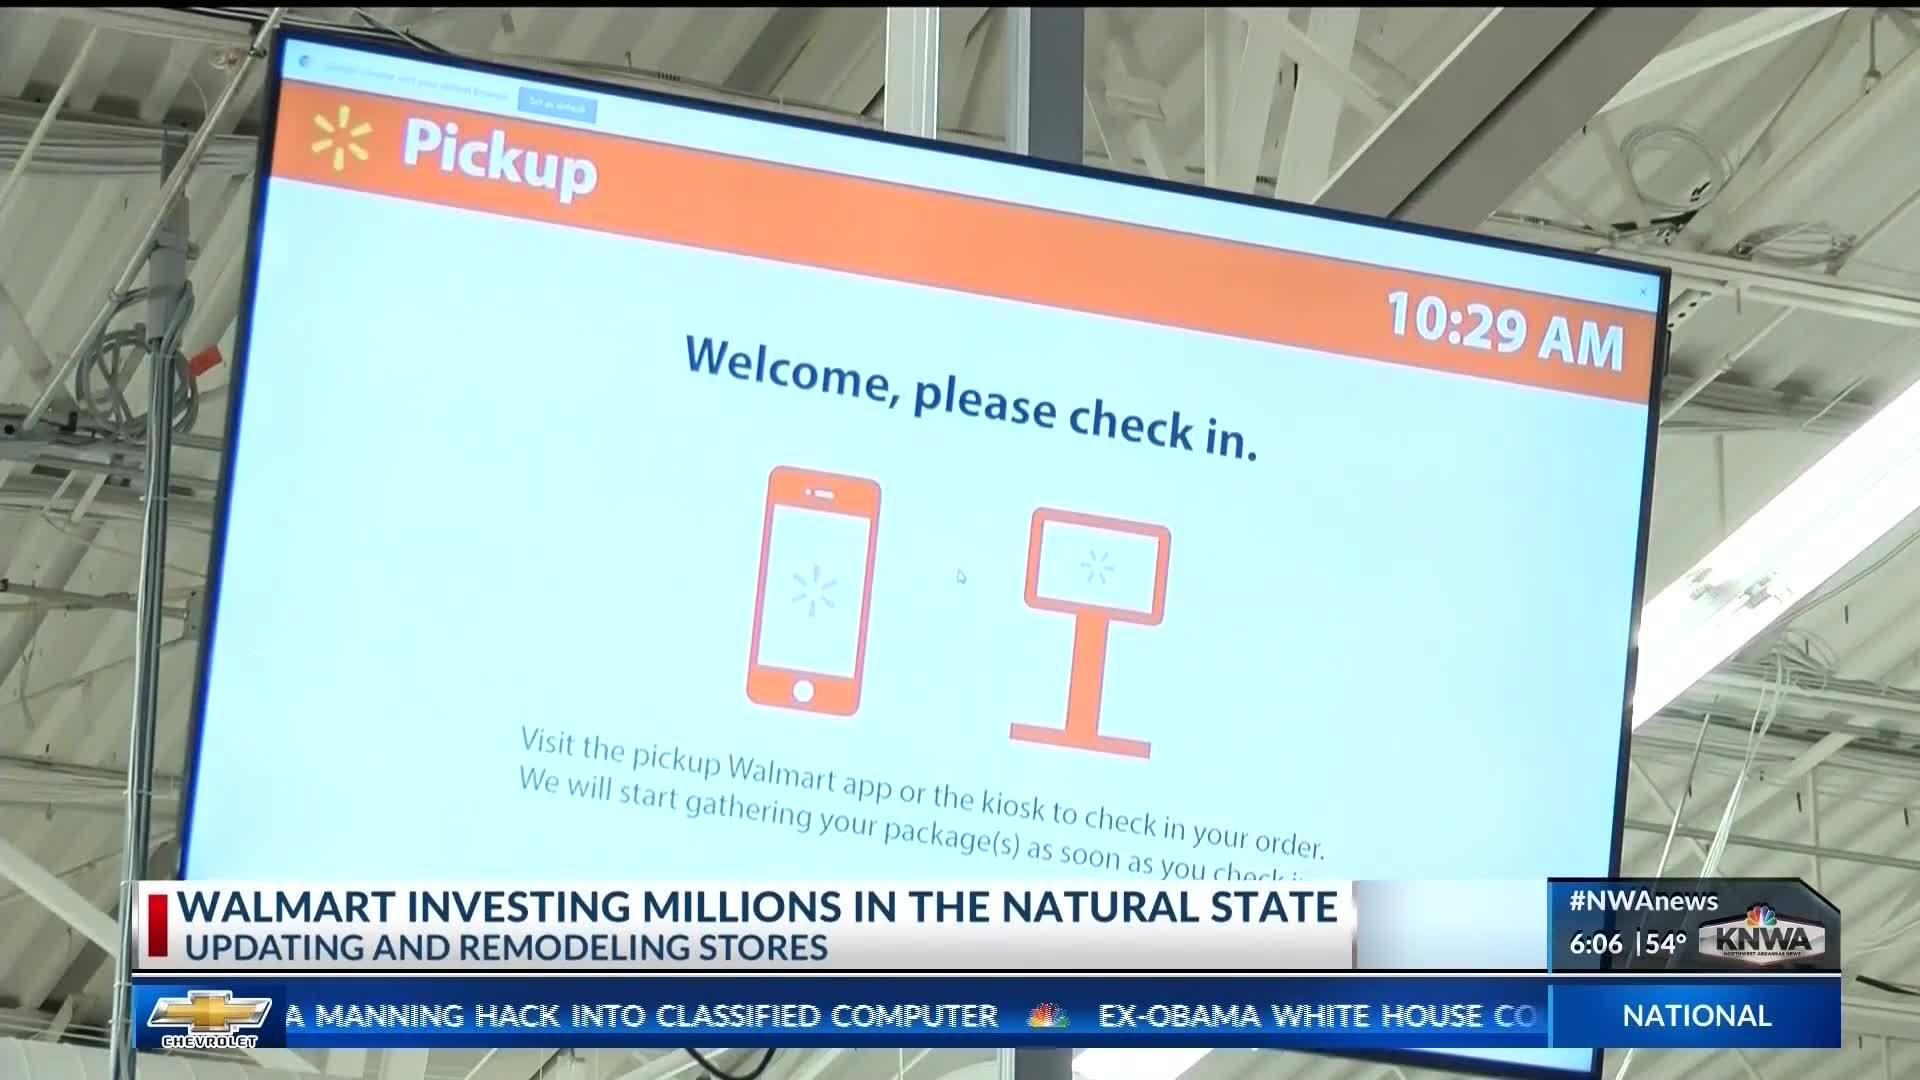 Walmart_buys_ad_tech_startup__KNWA__7_20190411235541